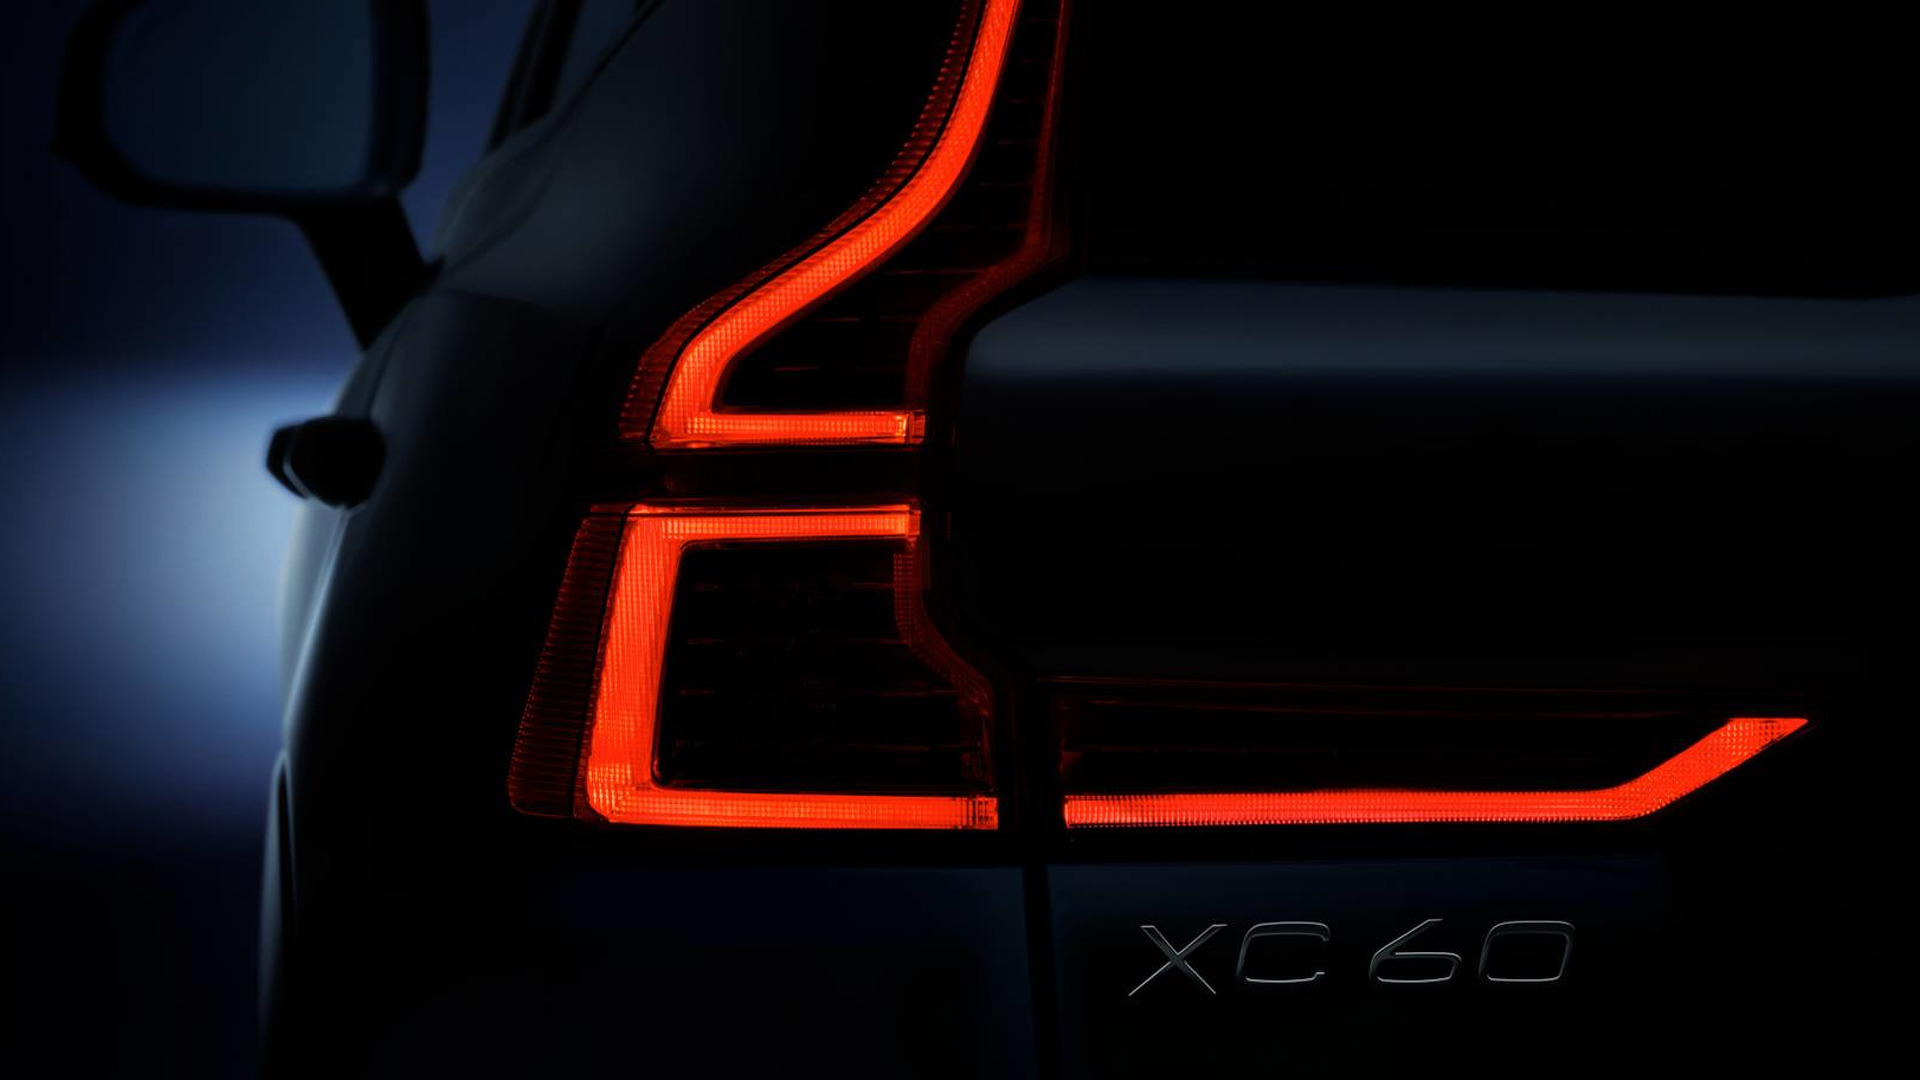 Volvo_XC60_Teaser_02